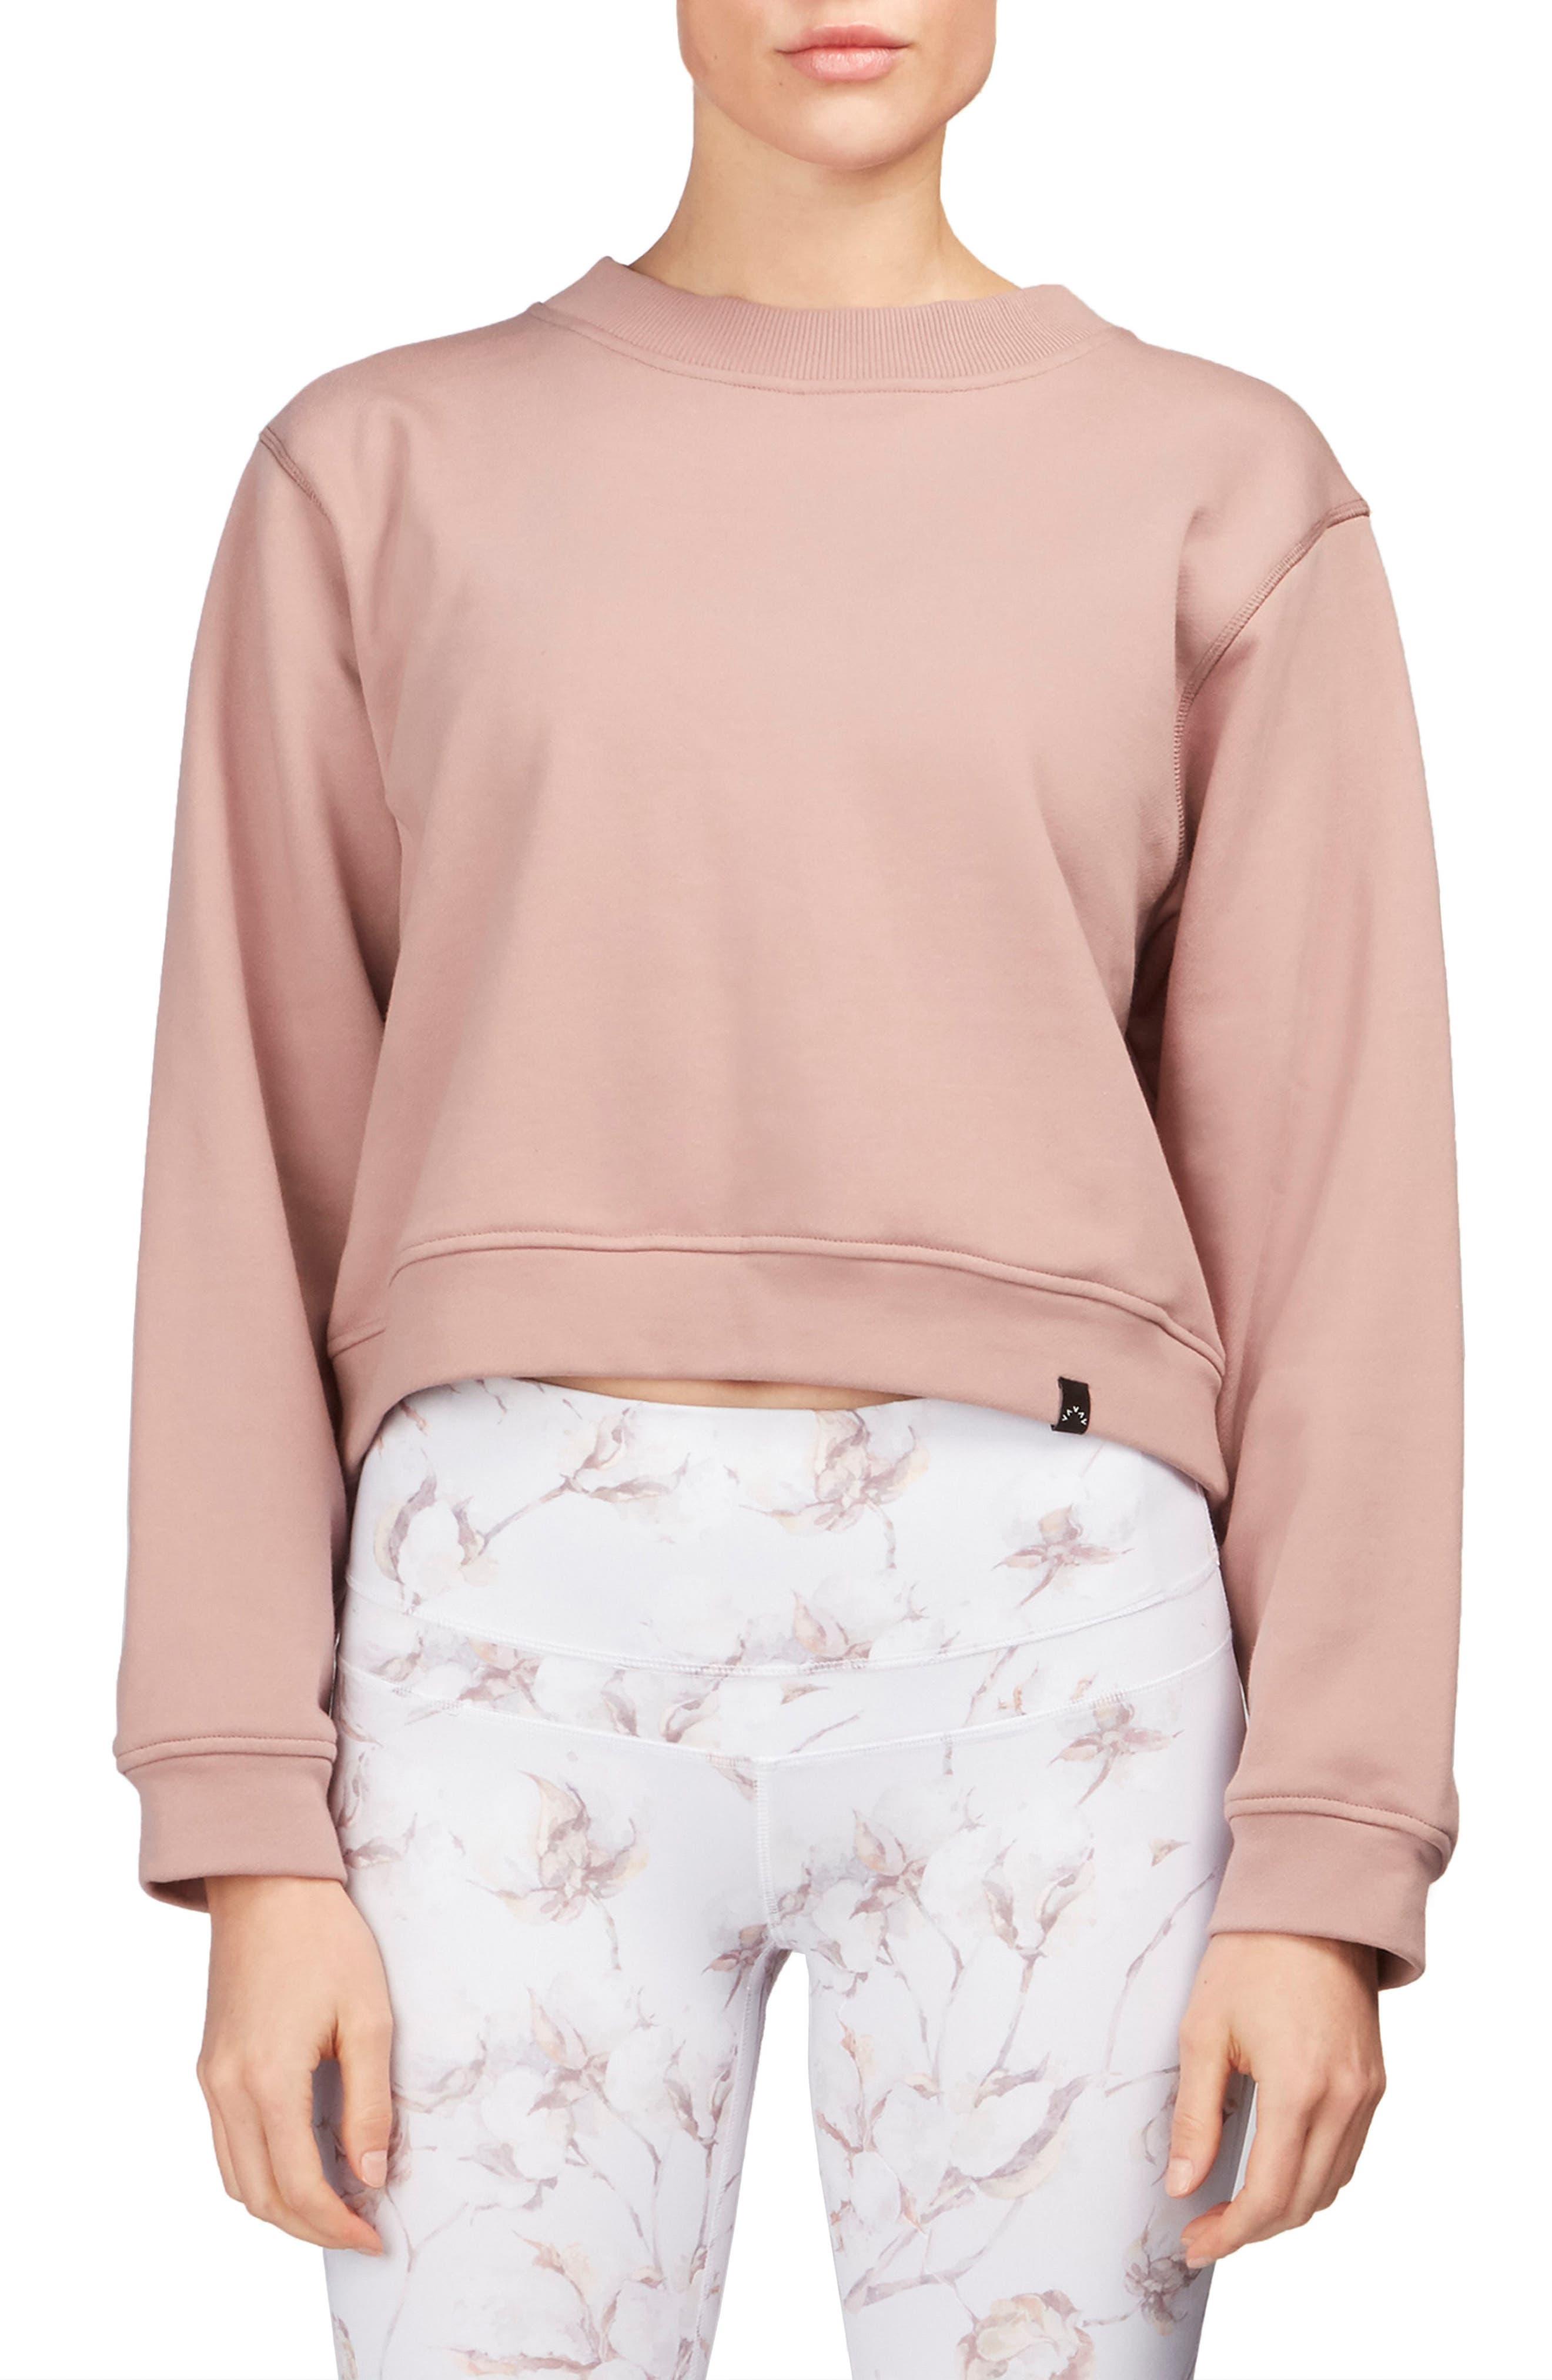 Albata Sweatshirt,                         Main,                         color, Lilac